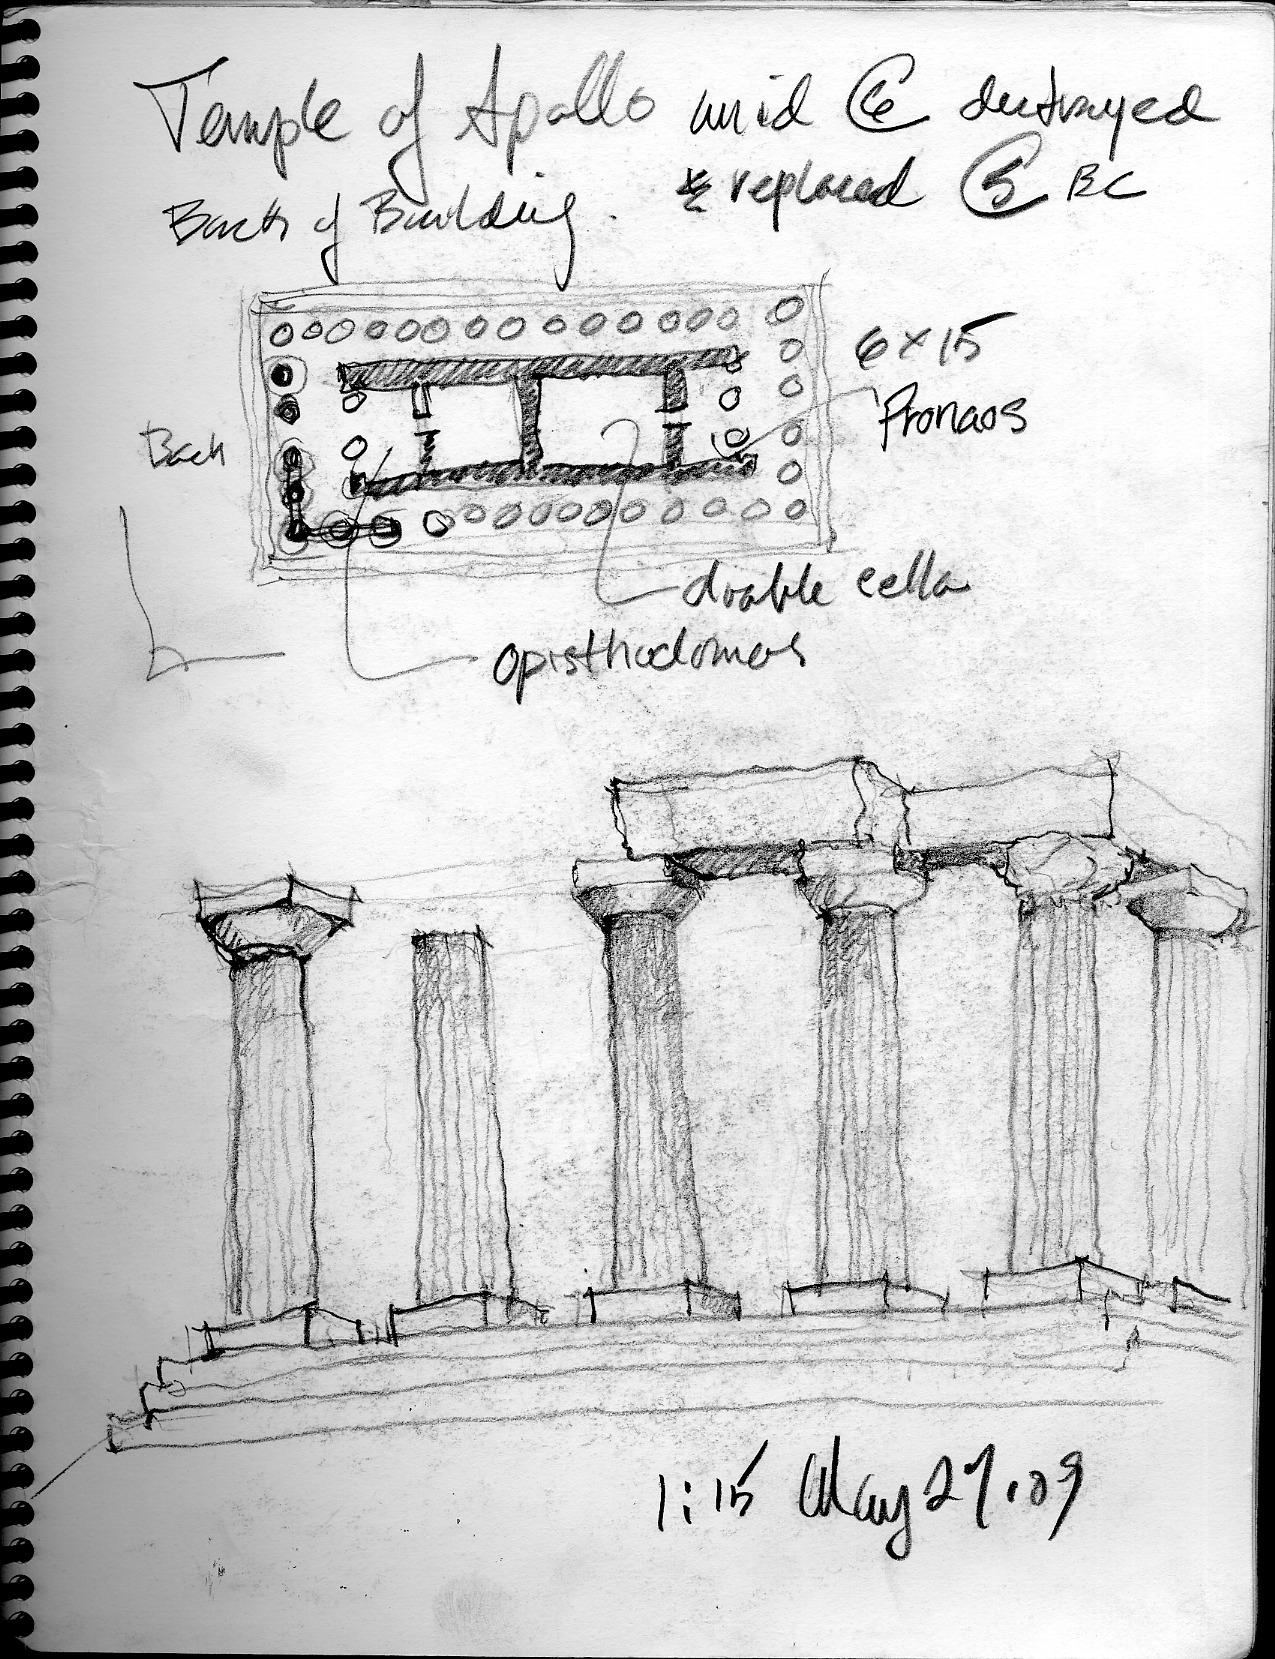 Book-pg73 temple of apollo way to thorikos.jpg